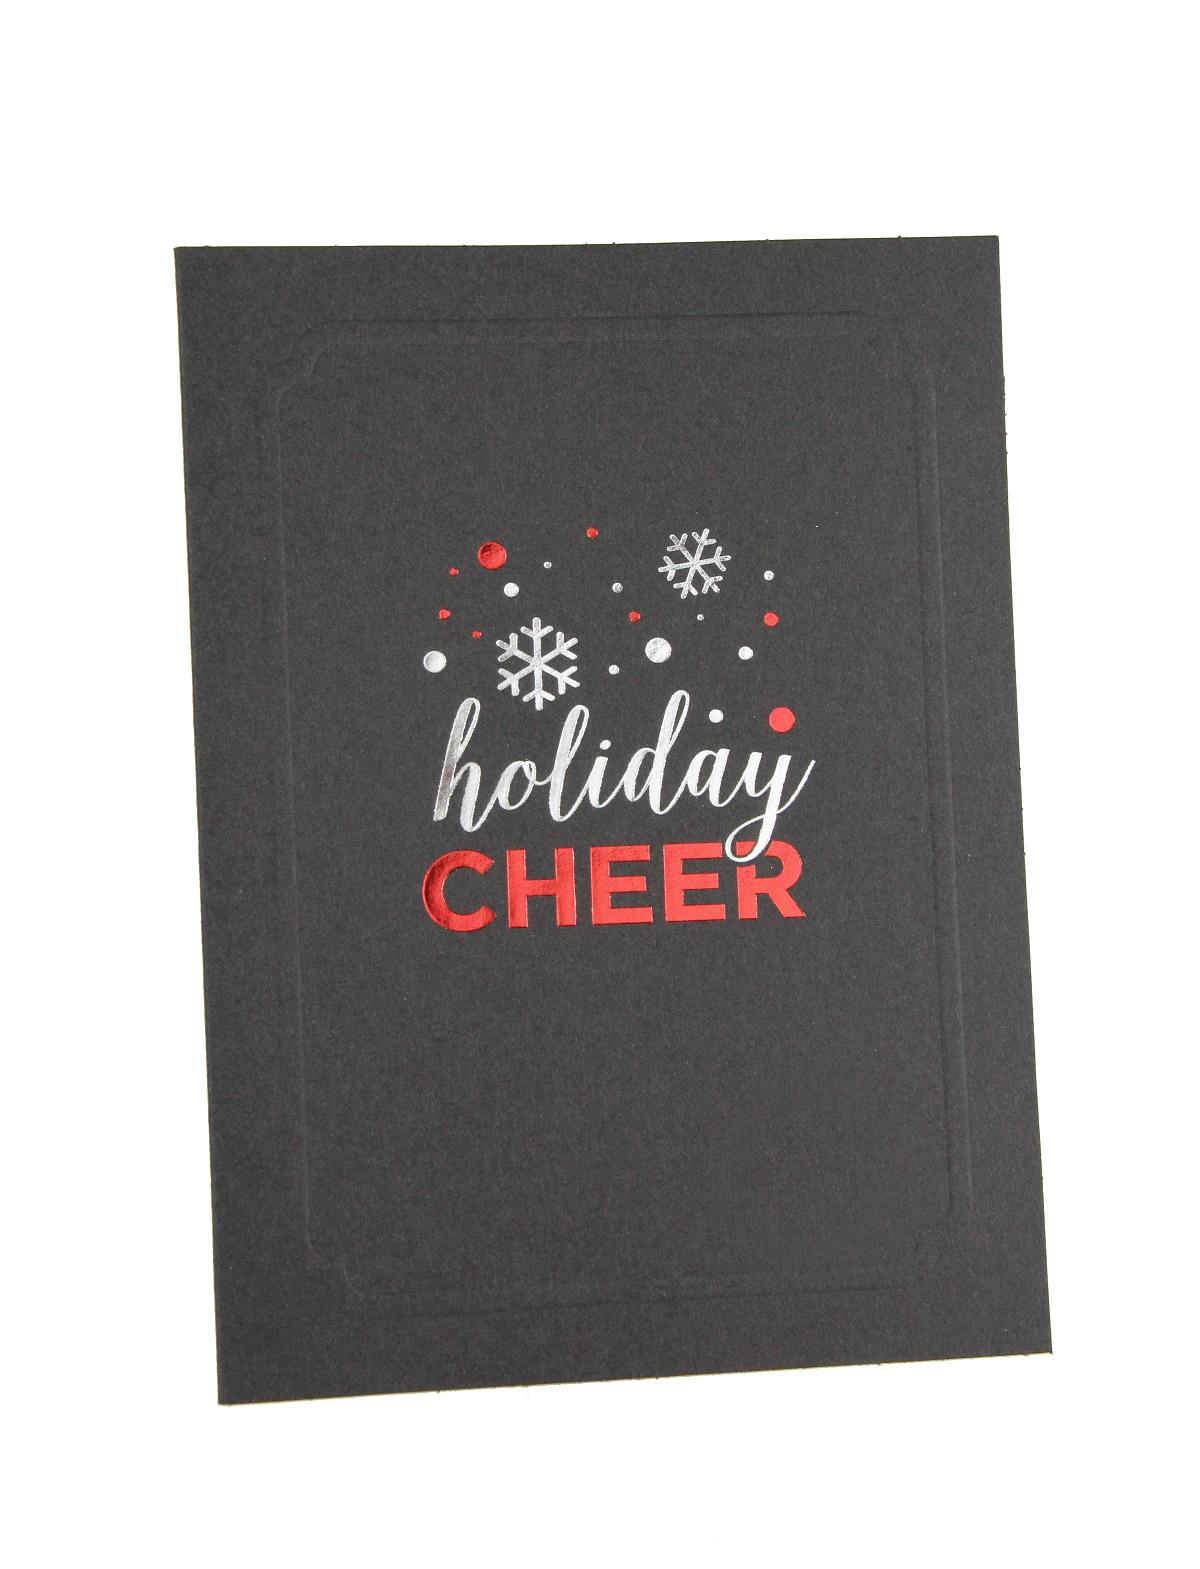 Tyndell Photographic Holiday Folder